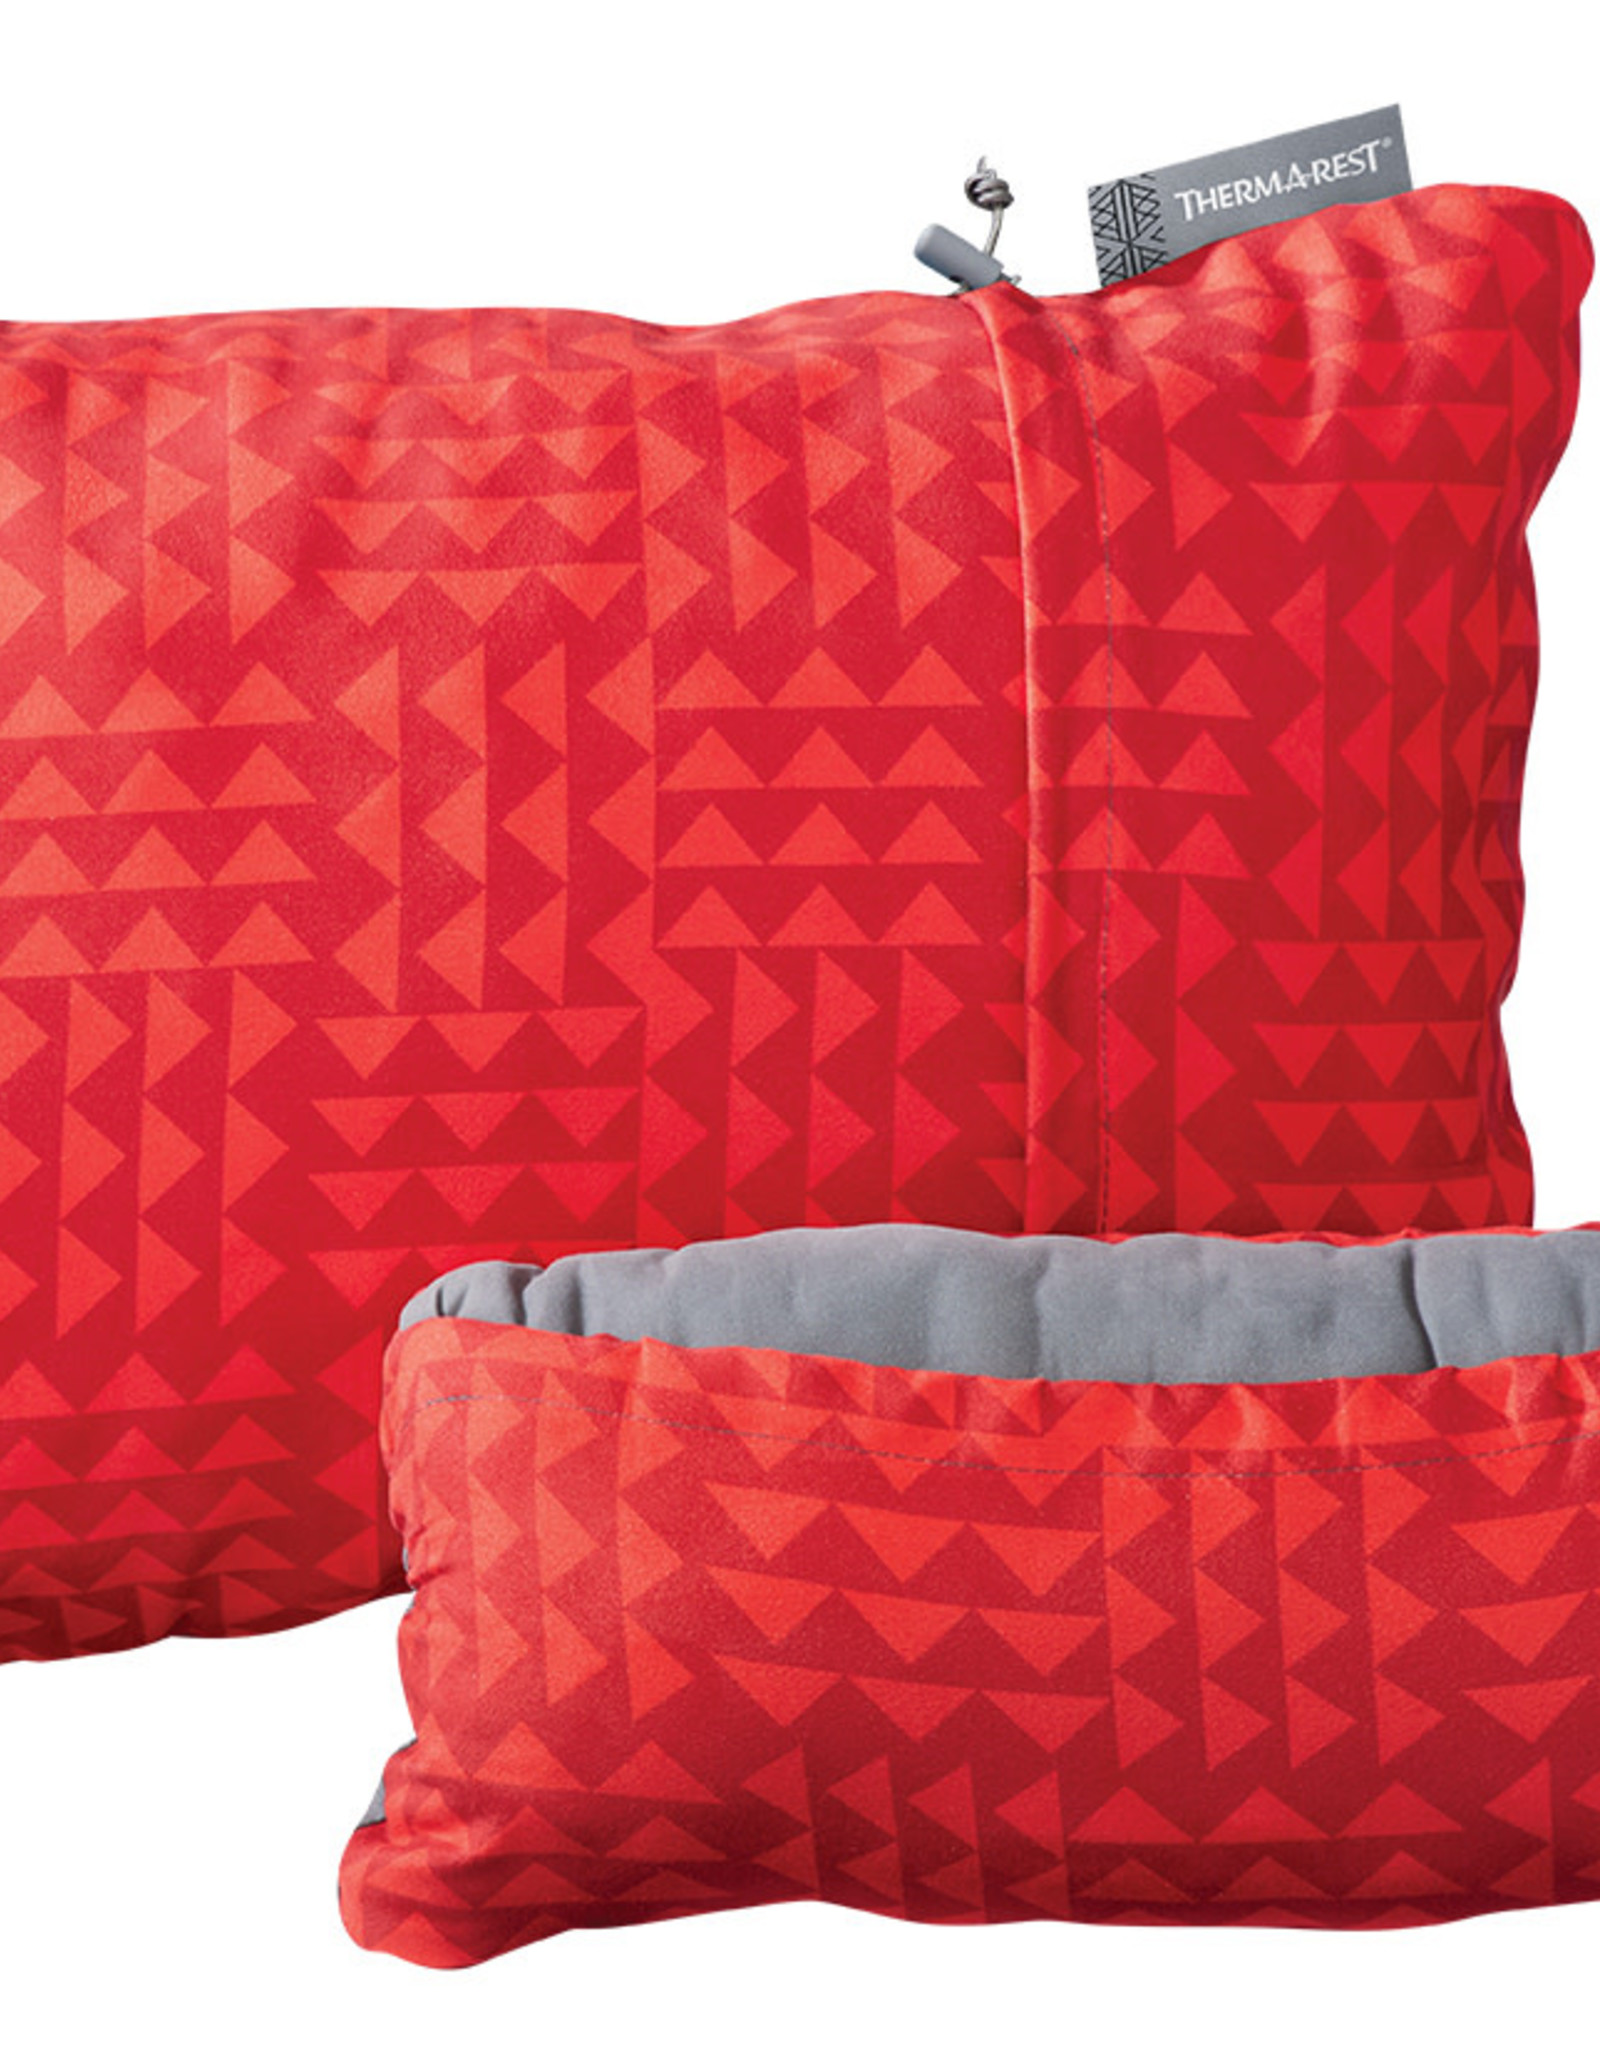 Therm-a-Rest Therm-a-Rest Comp Pillow S19